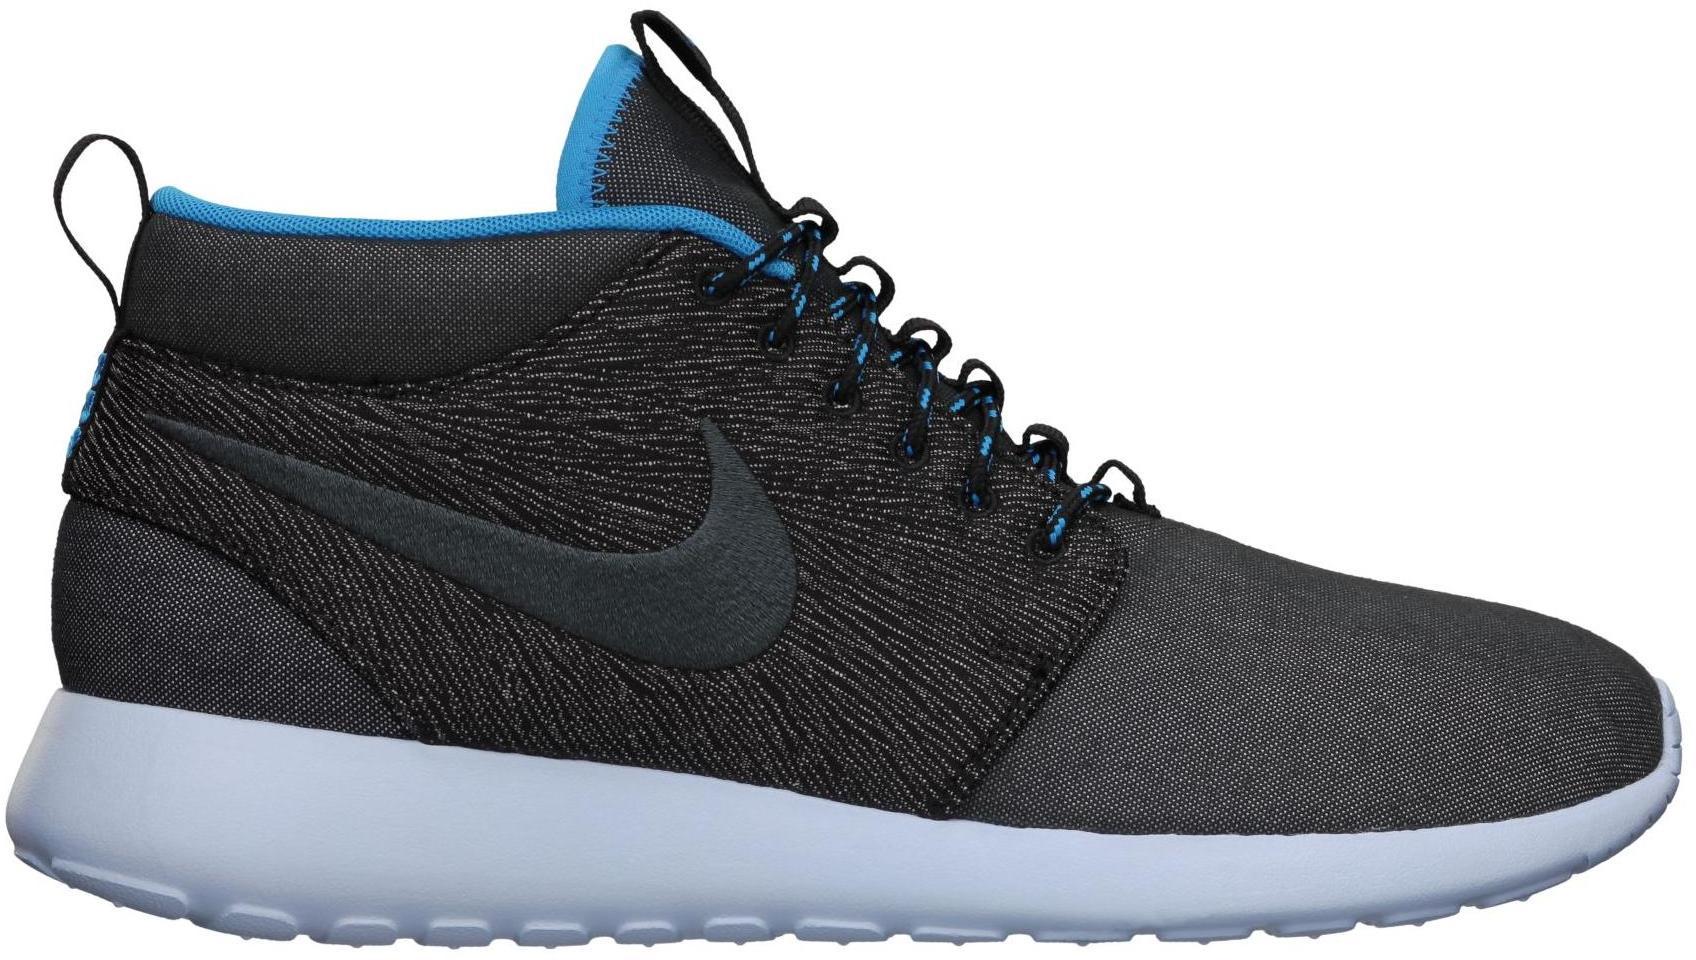 Nike Roshe Run Mid City Pack Paris